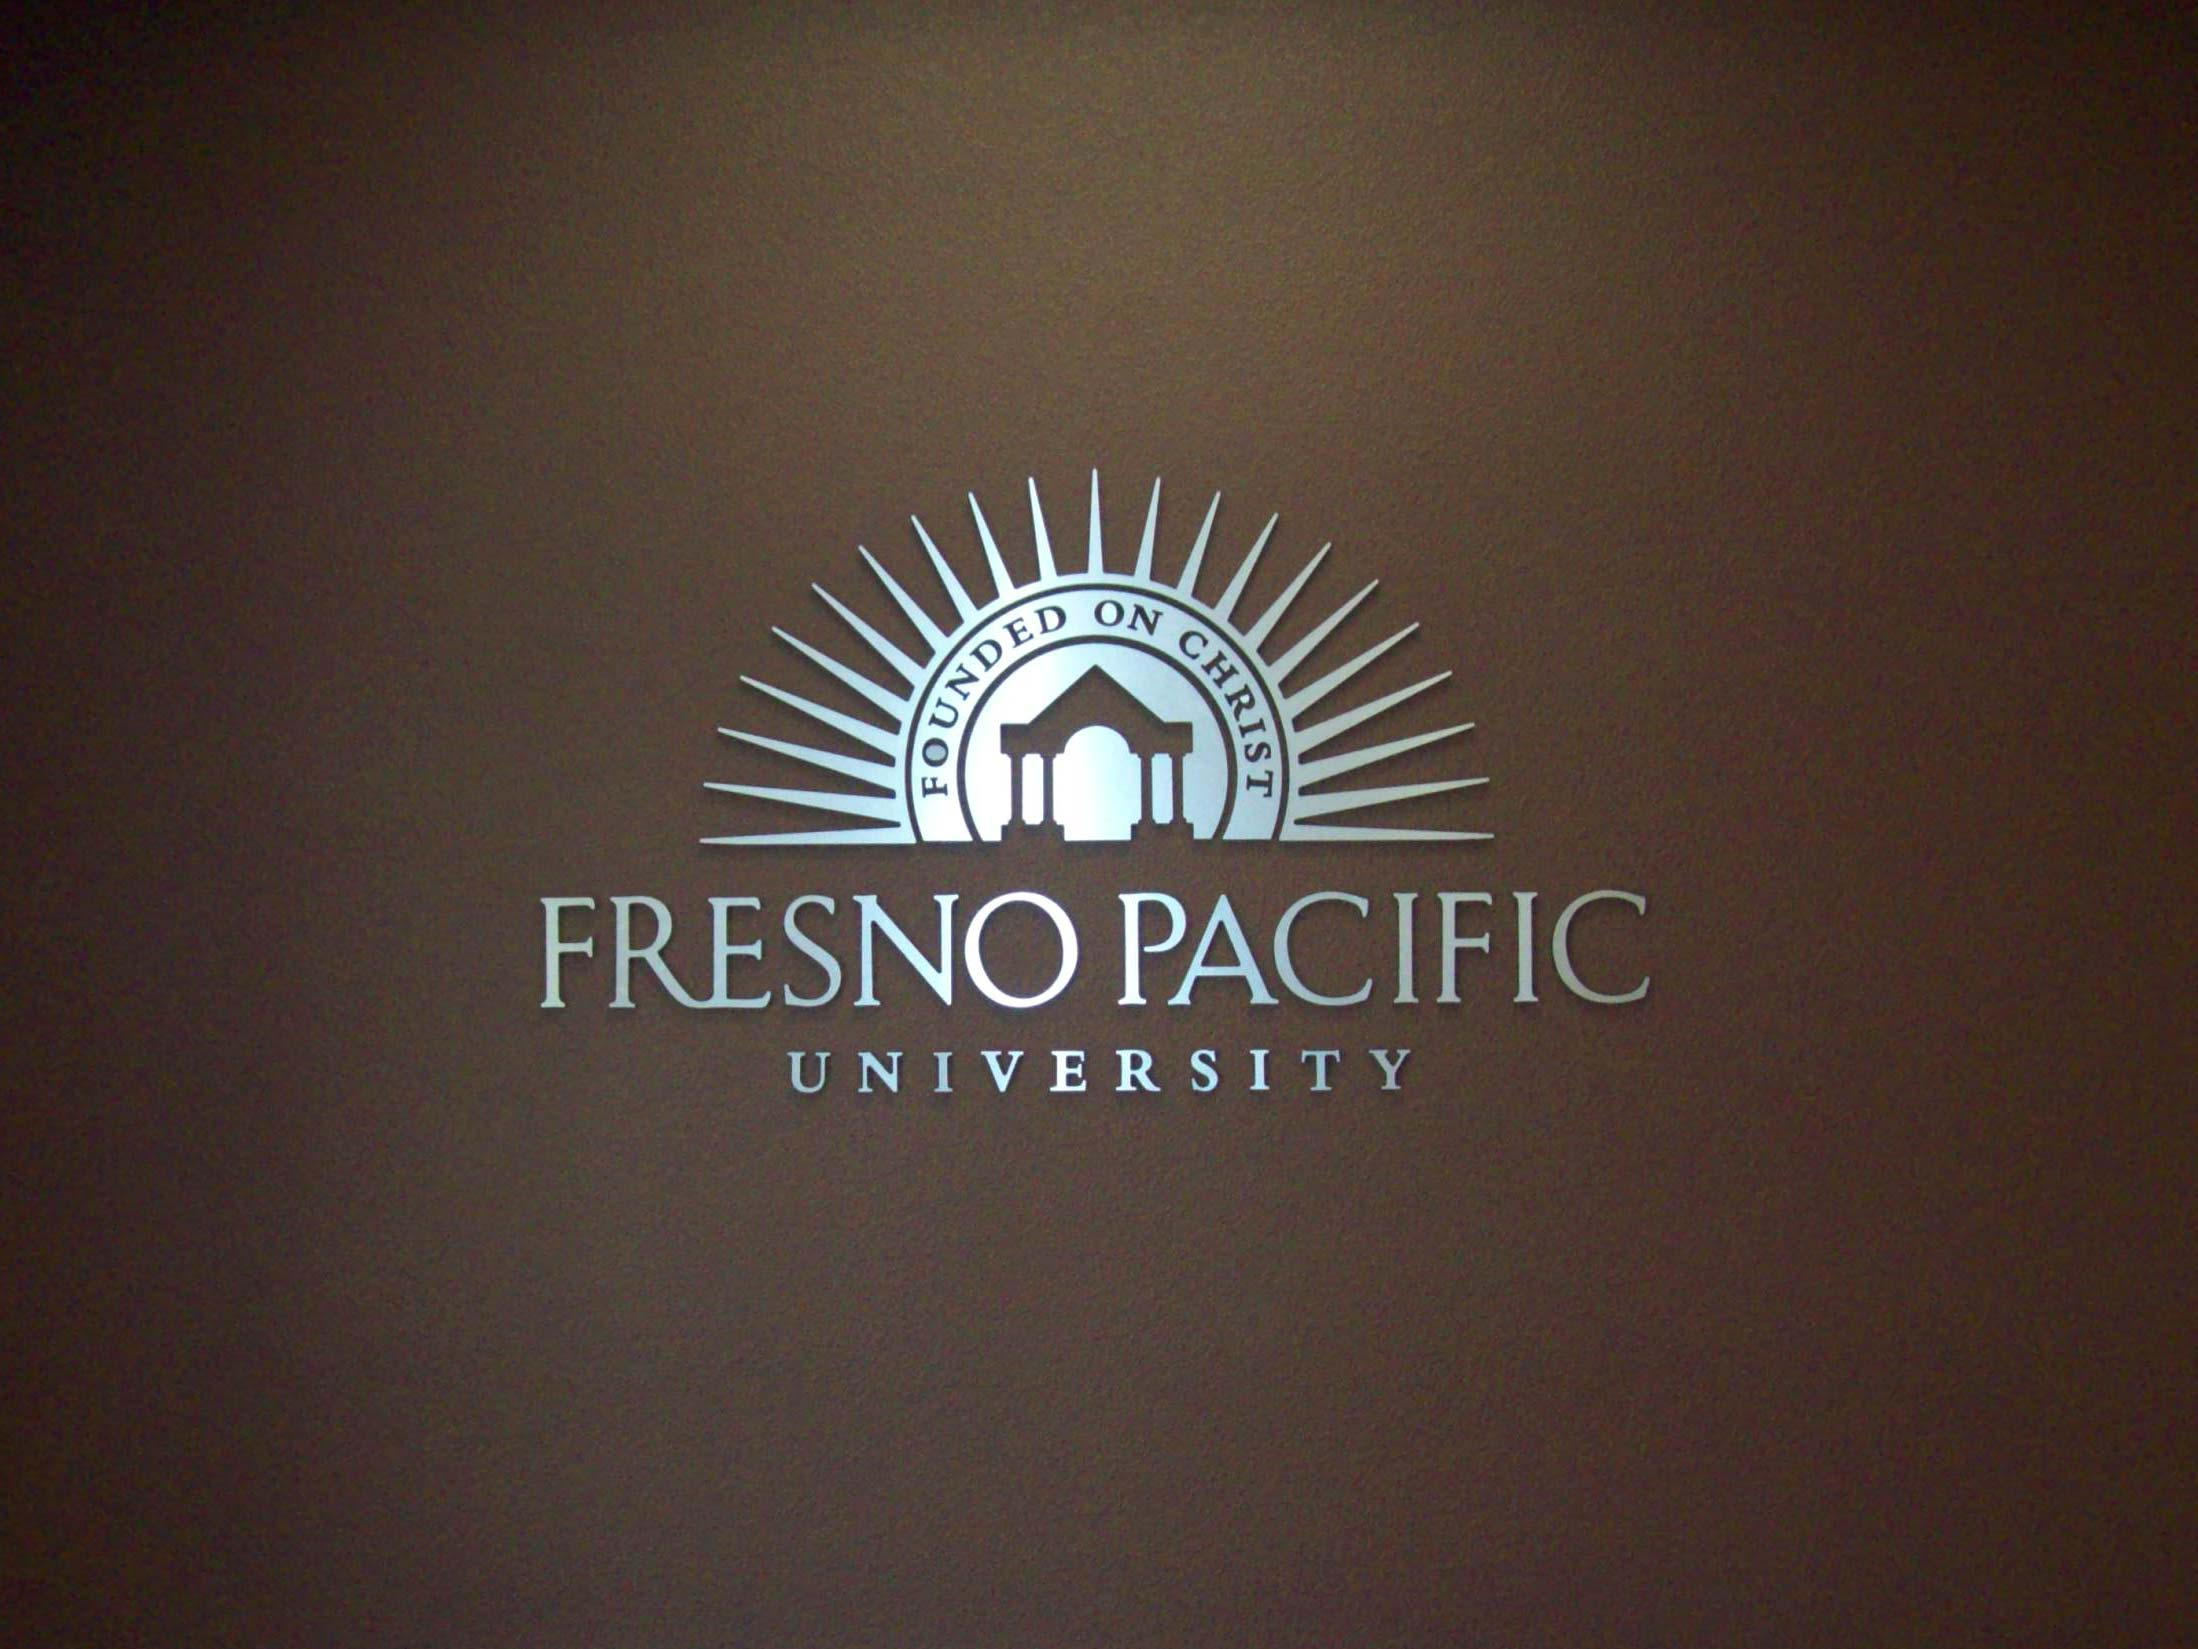 fresno_pacific-logo